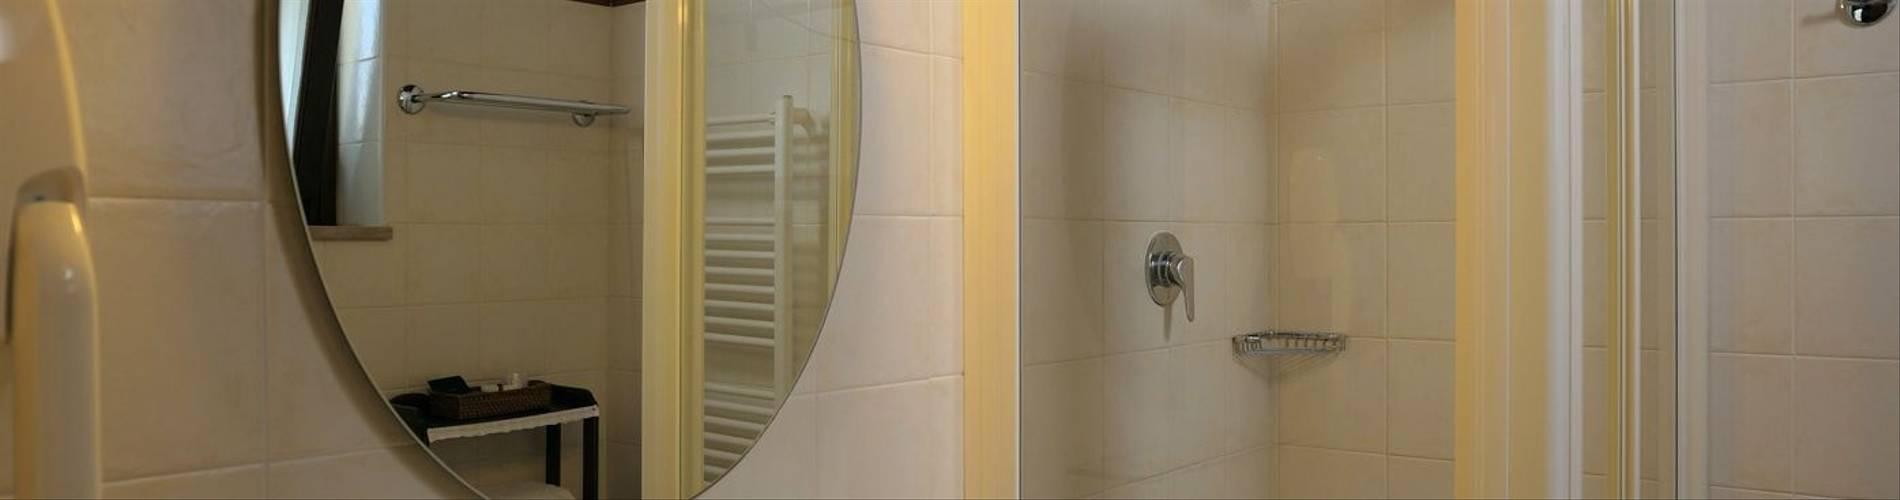 Il Nocino, Puglia, Italy, Comfort Room.jpg